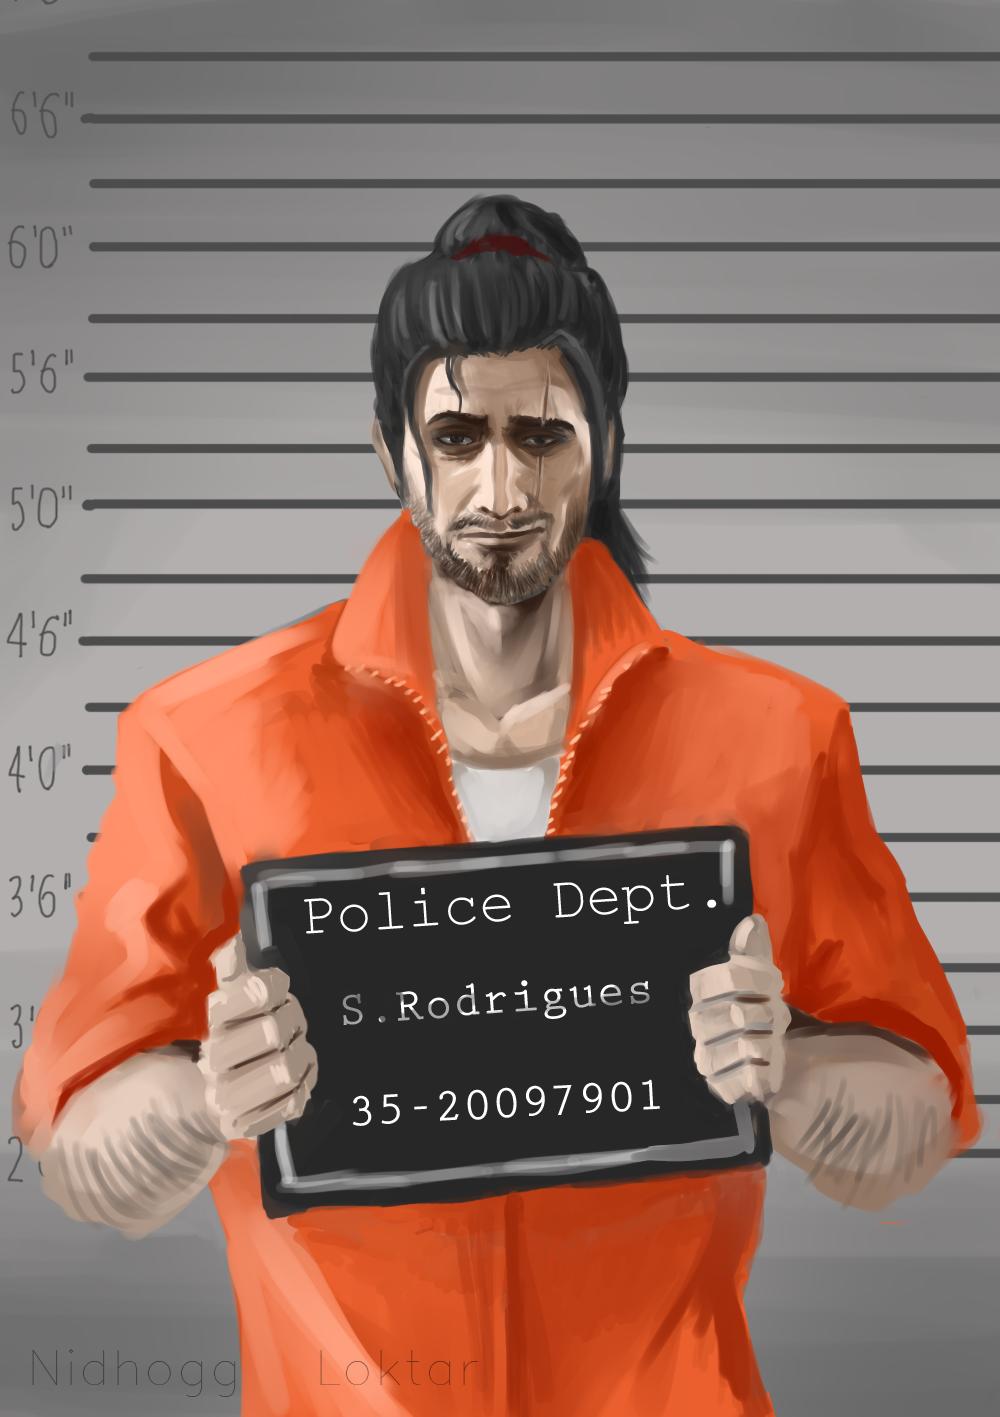 Samuel Rodrigues サムエルホドリゲス A Jailed Samurai